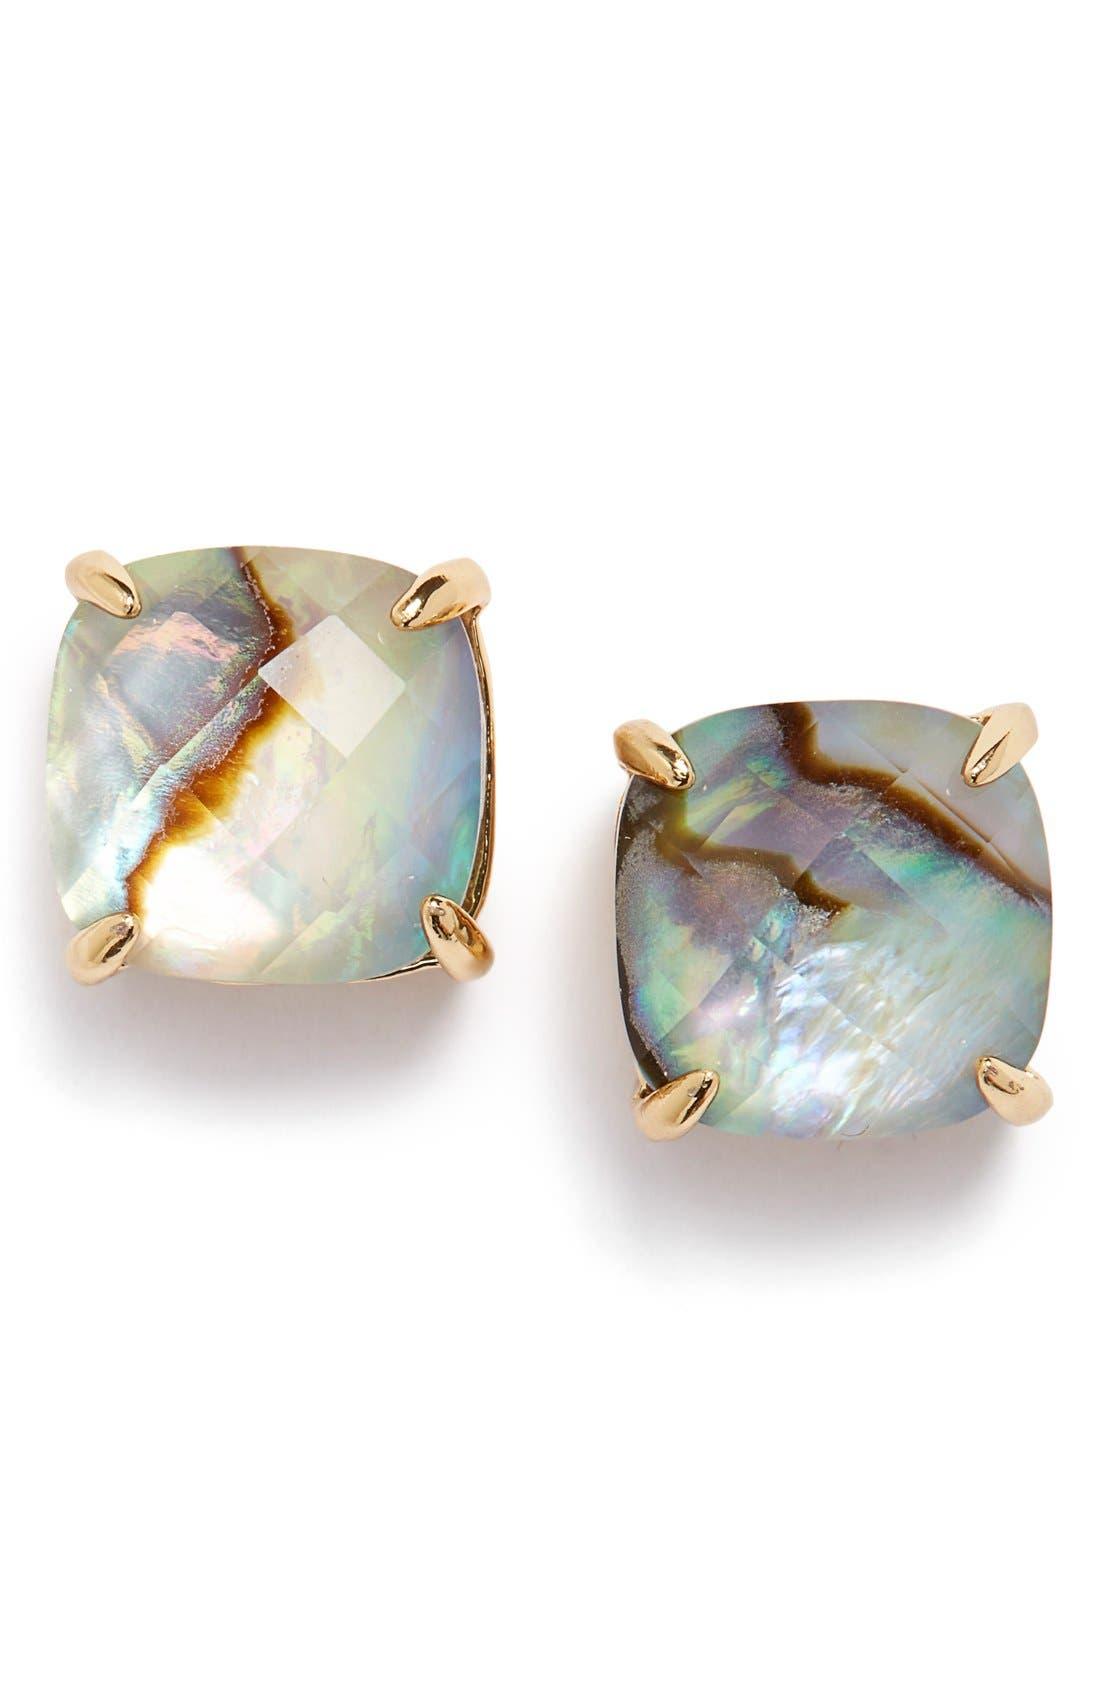 Alternate Image 1 Selected - kate spade new york mini small square semiprecious stone stud earrings